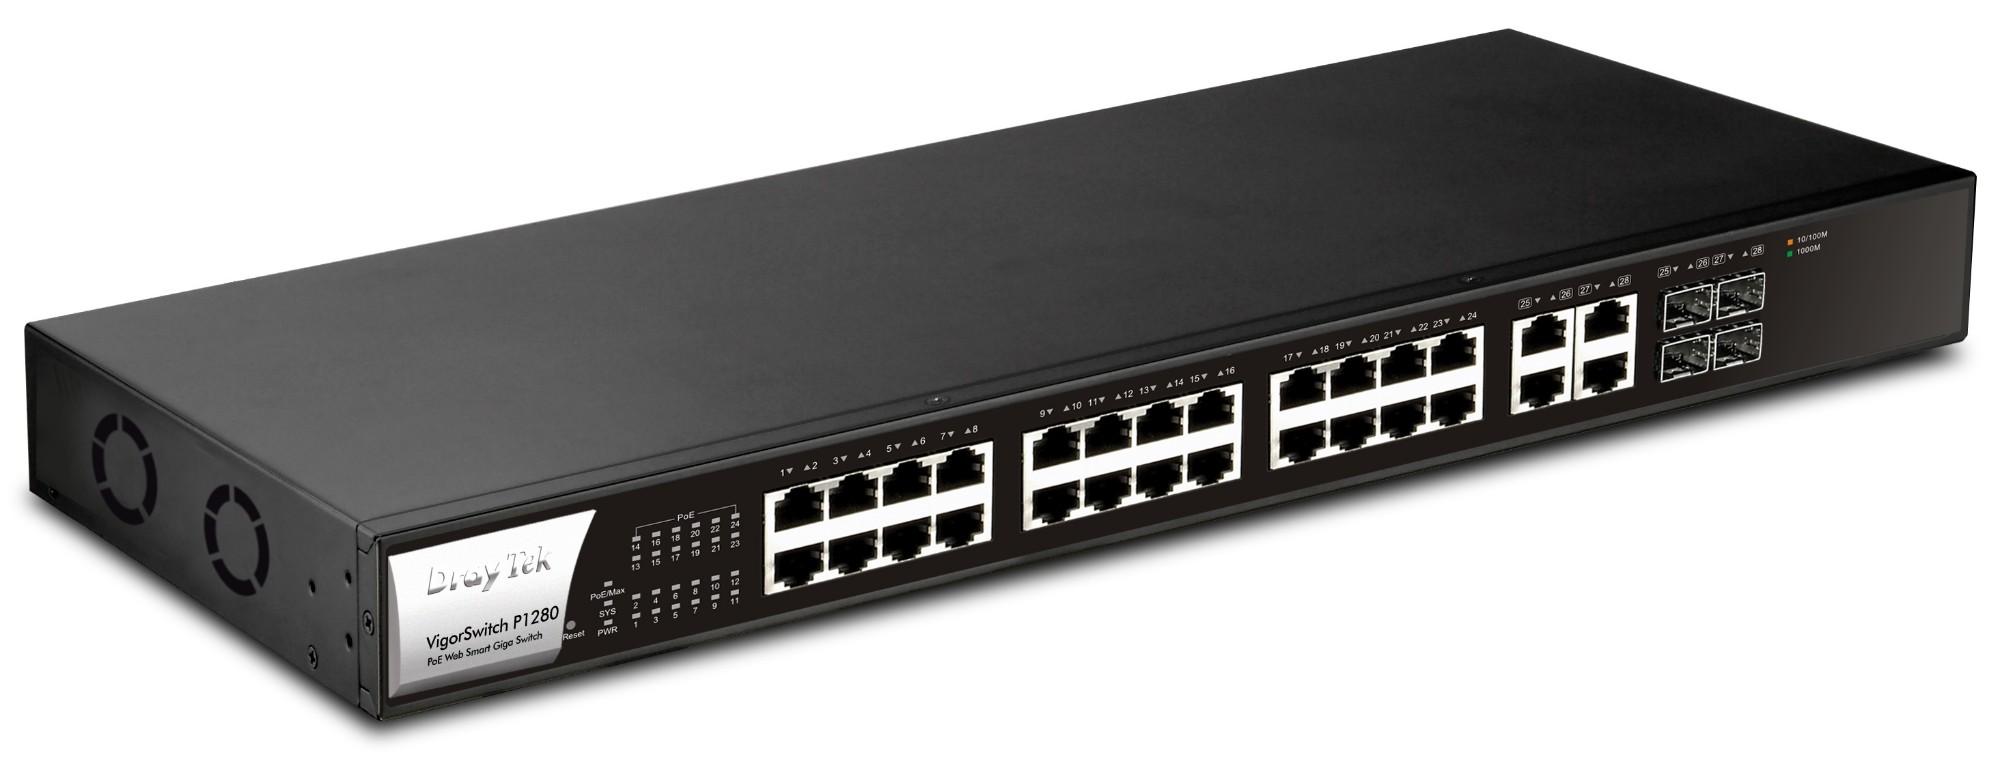 Draytek VigorSwitch P1280 - 28-Port PoE+ Web Smart Gigabit Switch